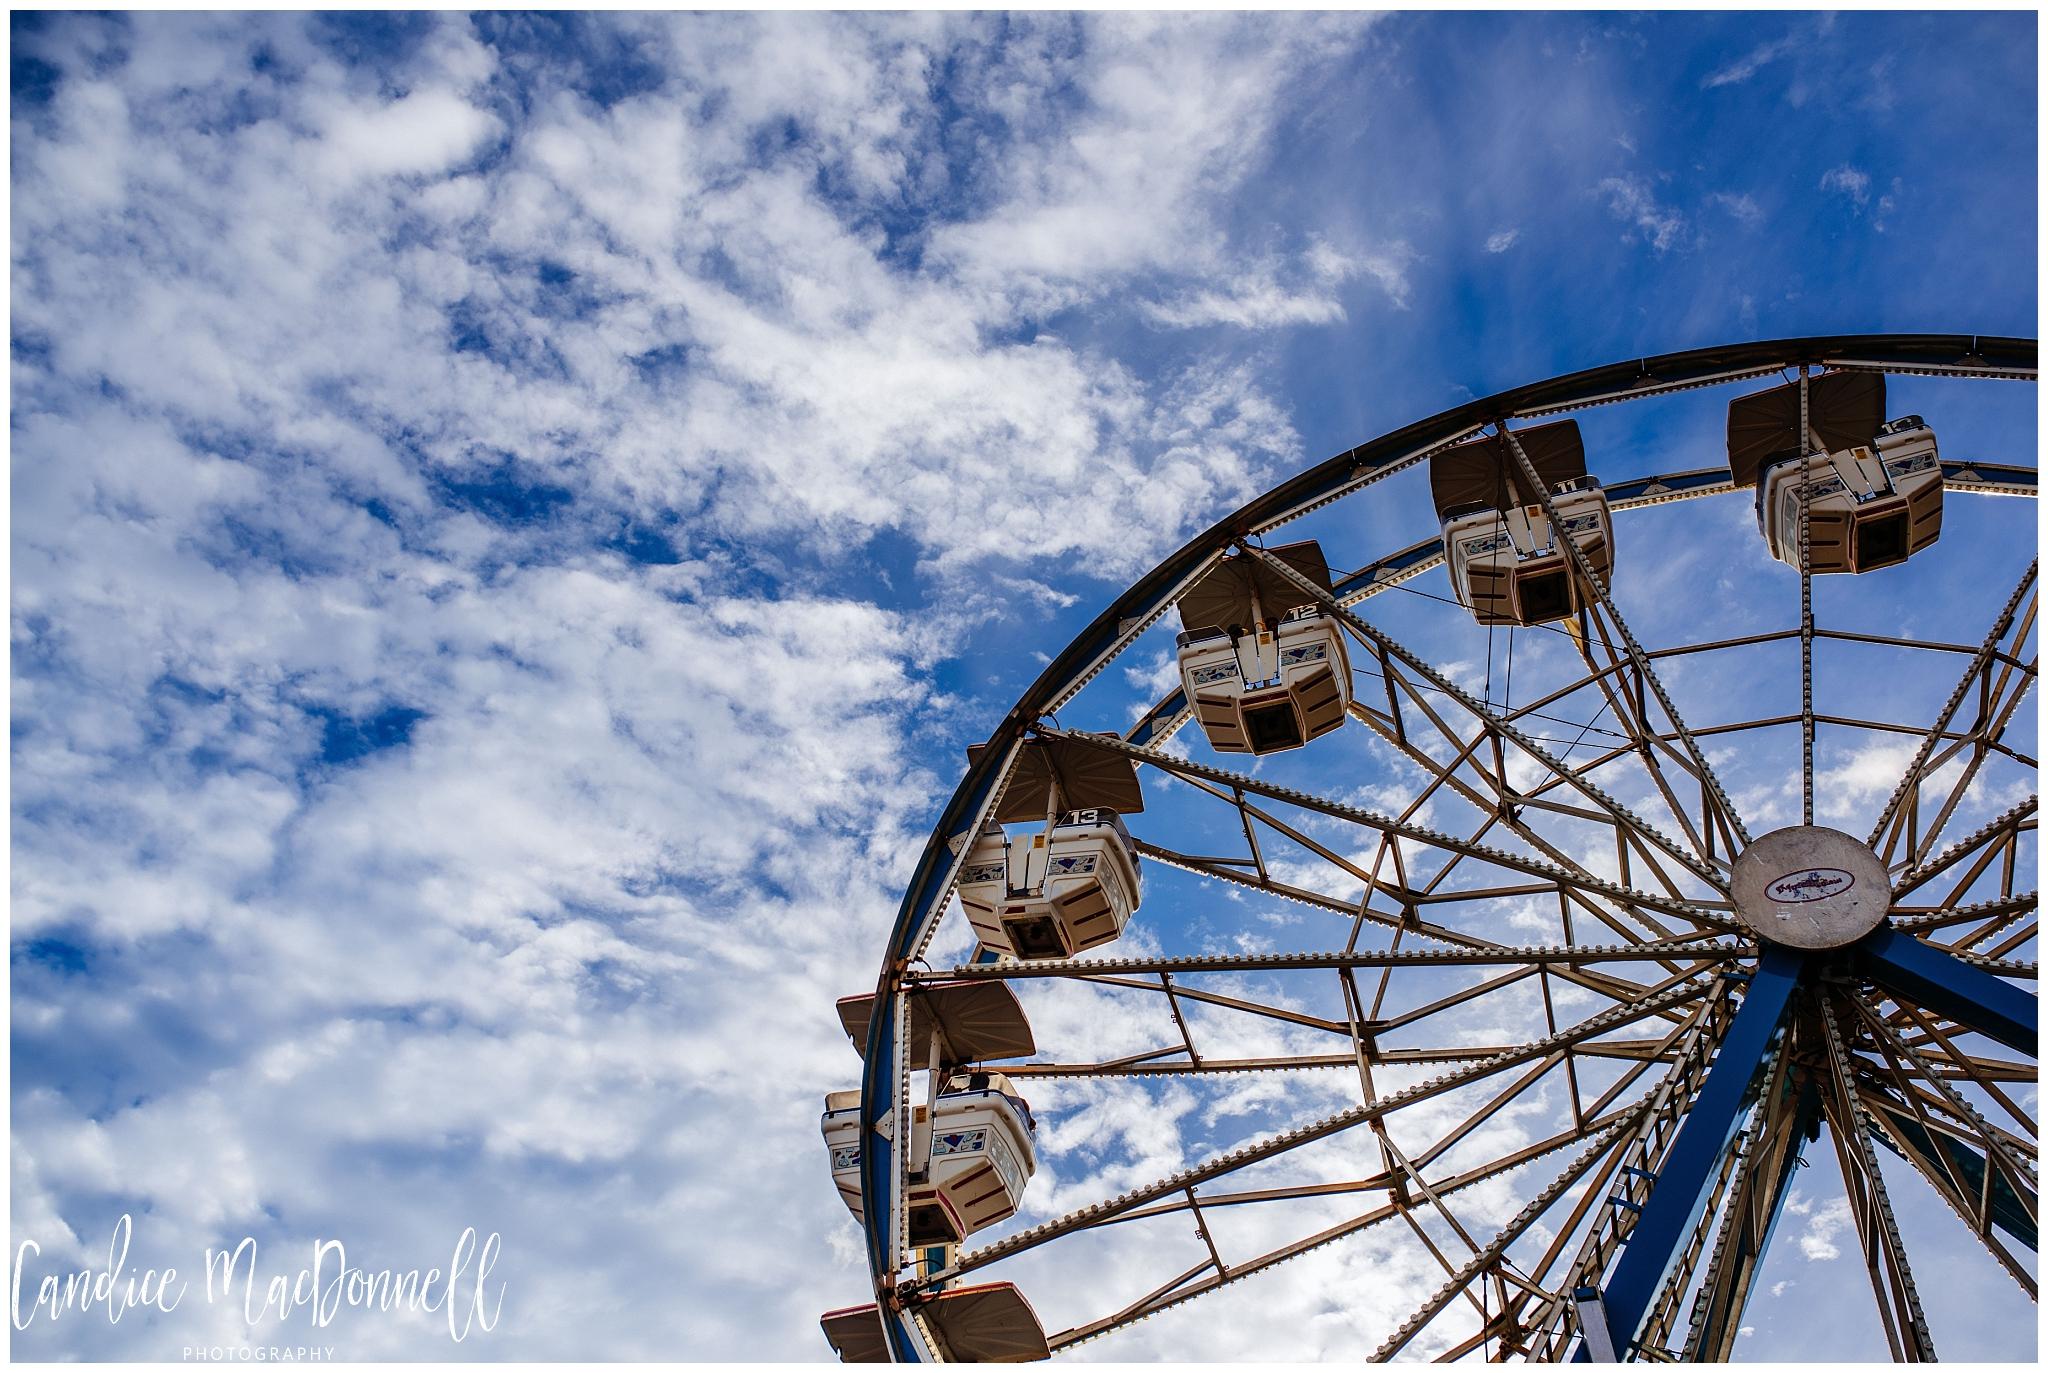 Candice MacDonnell Photography - Hawaii State Fair - Ferris Wheel